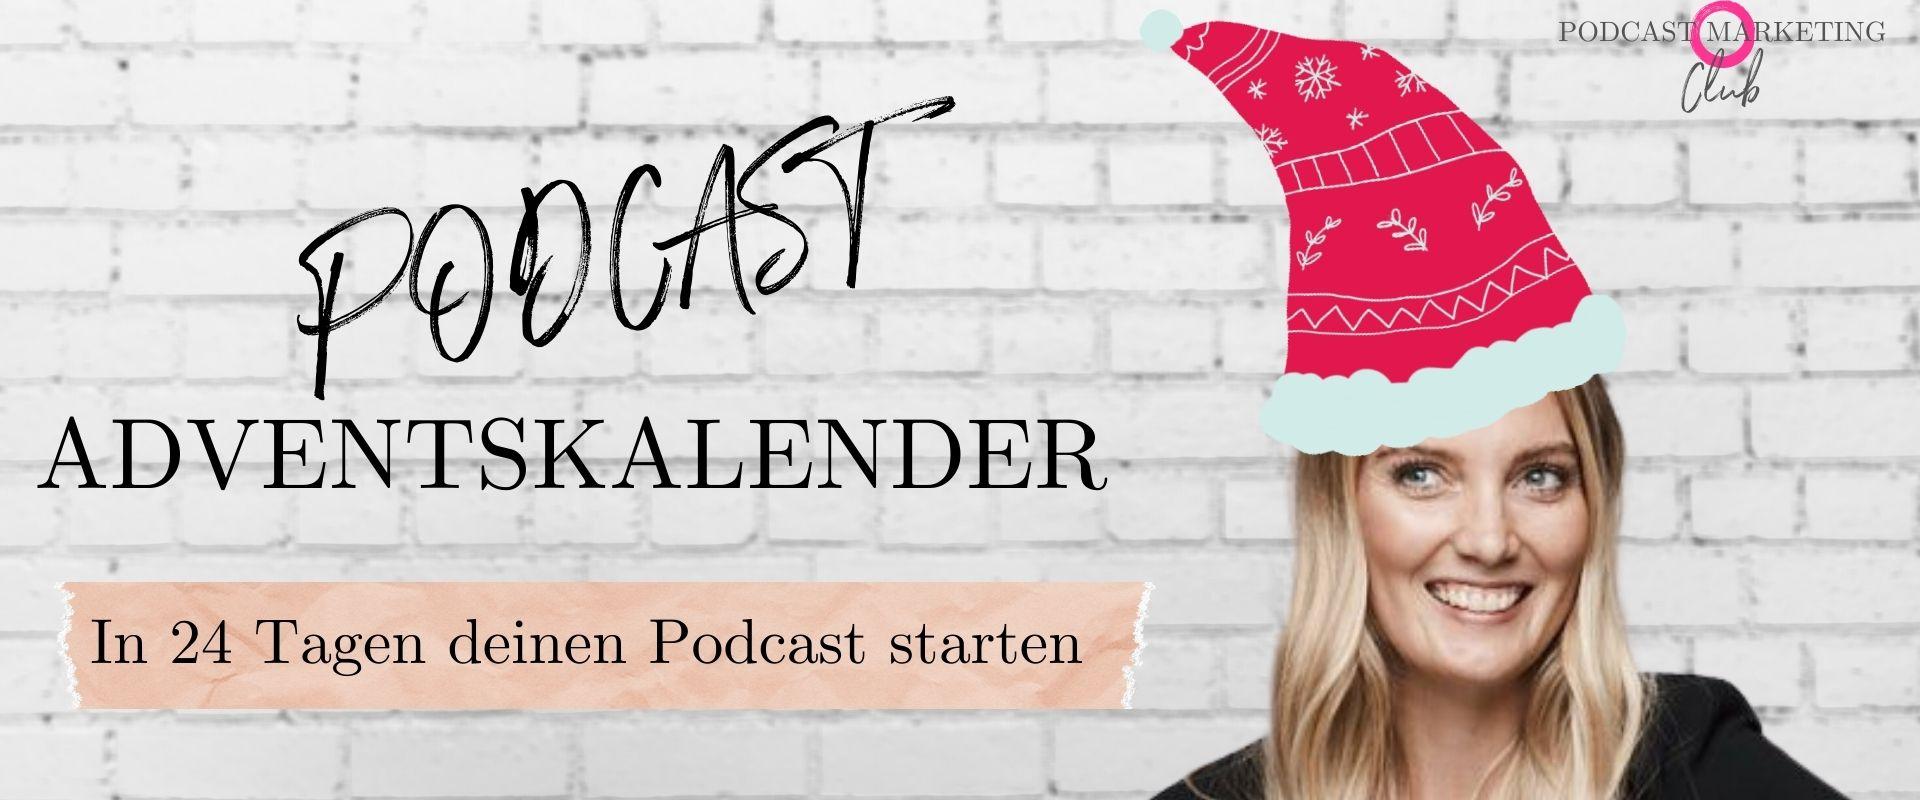 Podcast_Marketing_Adventskalender